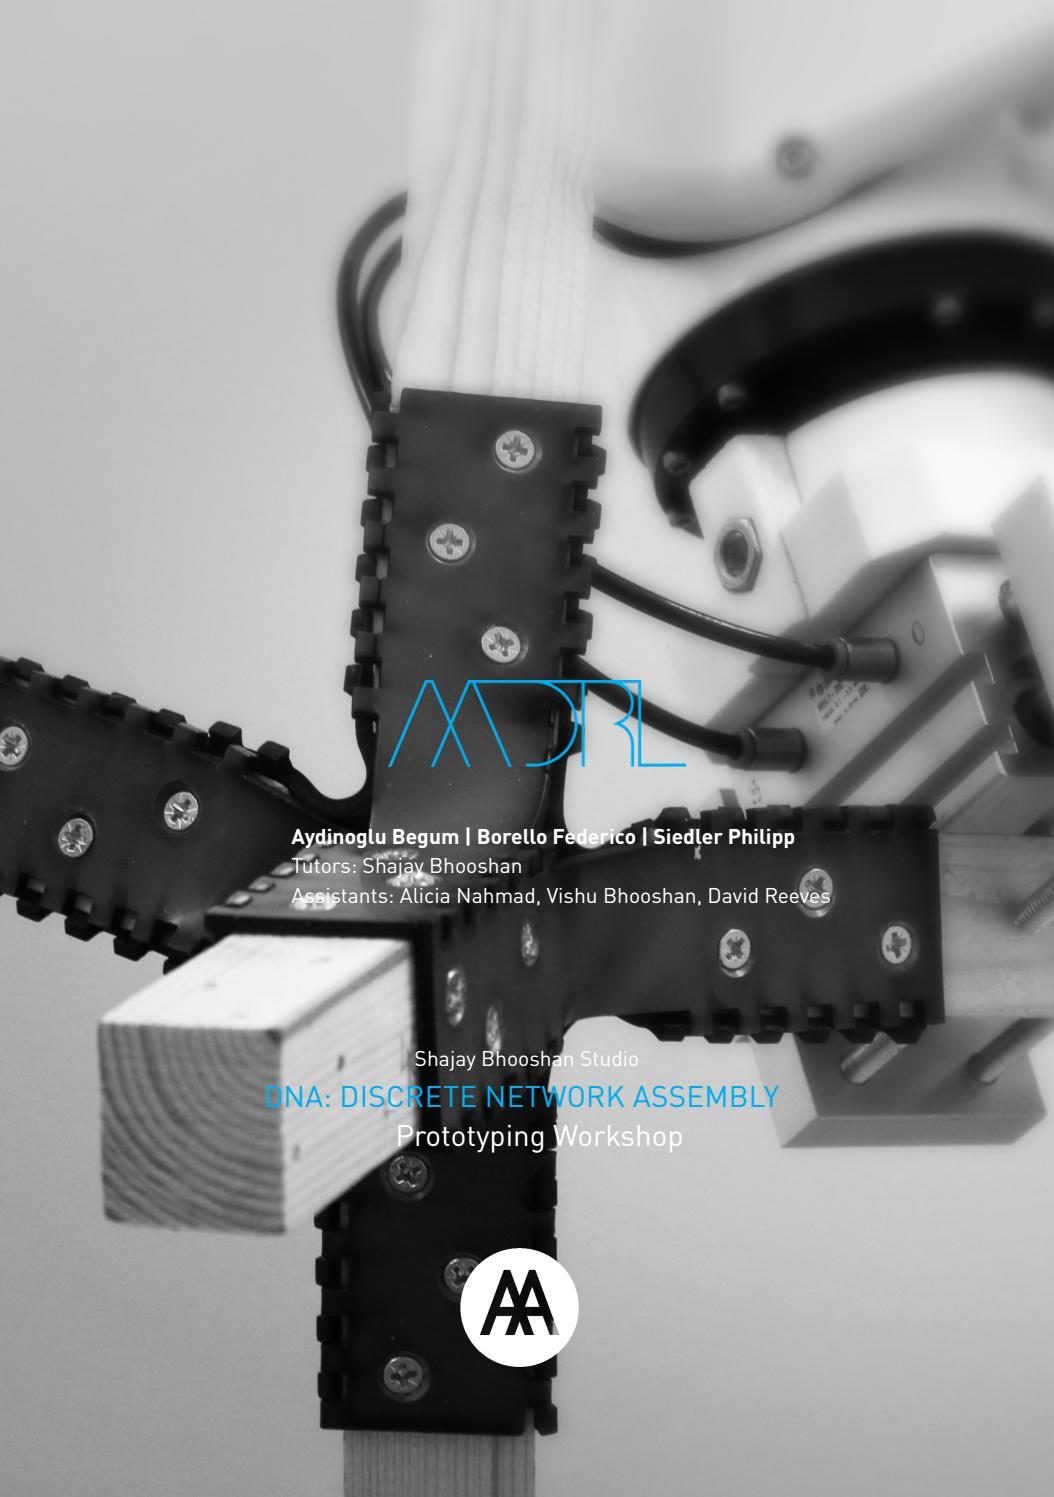 AADRL Prototyping Workshop DNA Phase 2